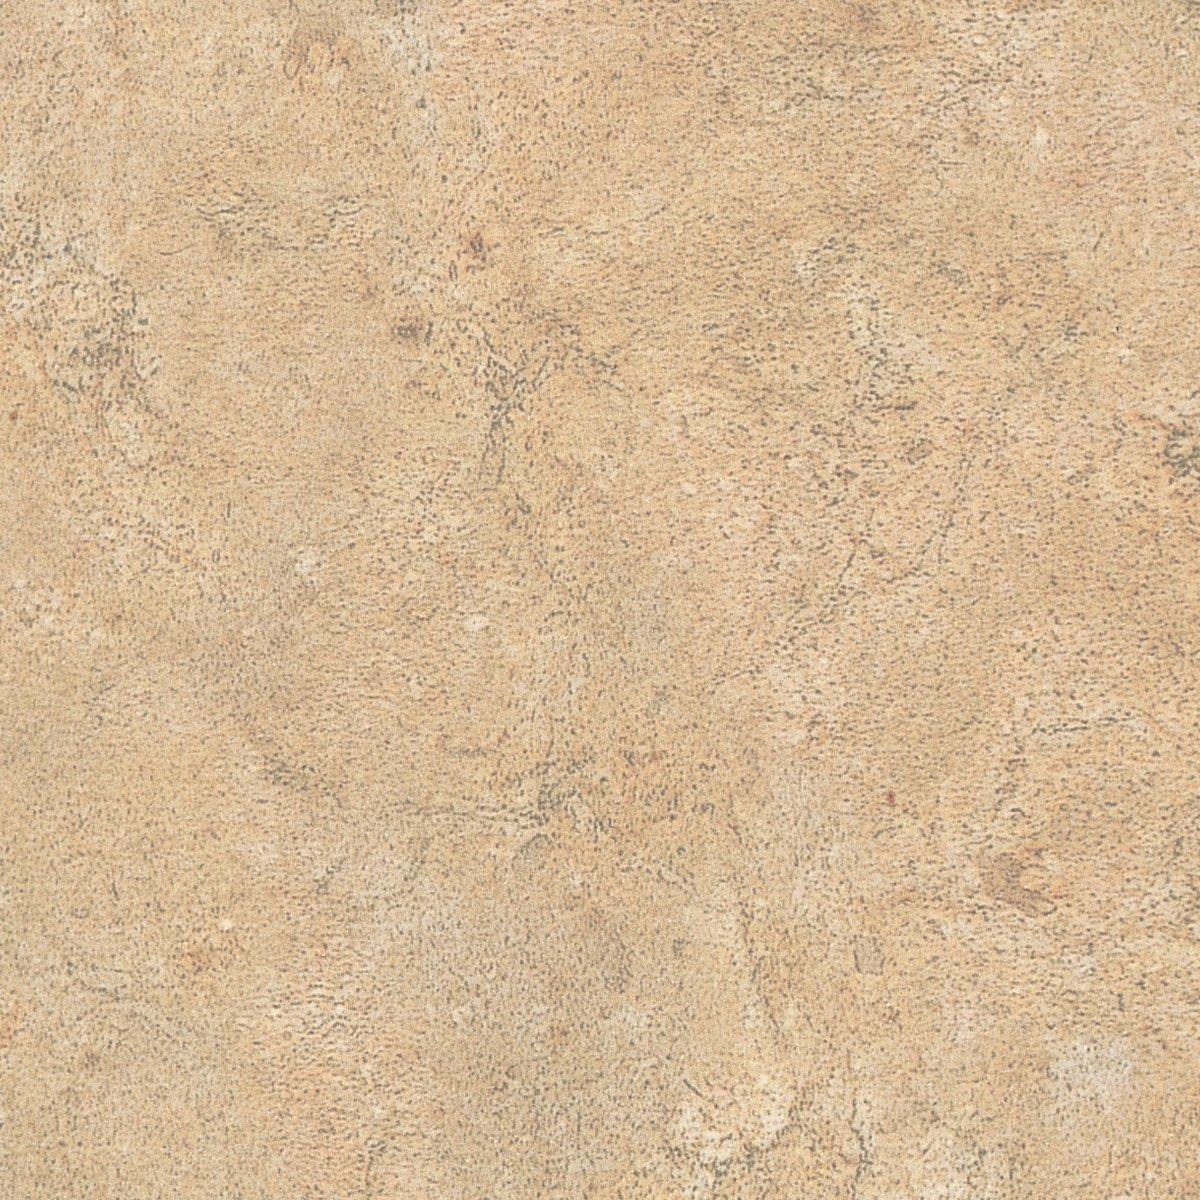 Formica Brand Laminate 072651234708000 Sand Stone Laminate, Sand Stone Scovato